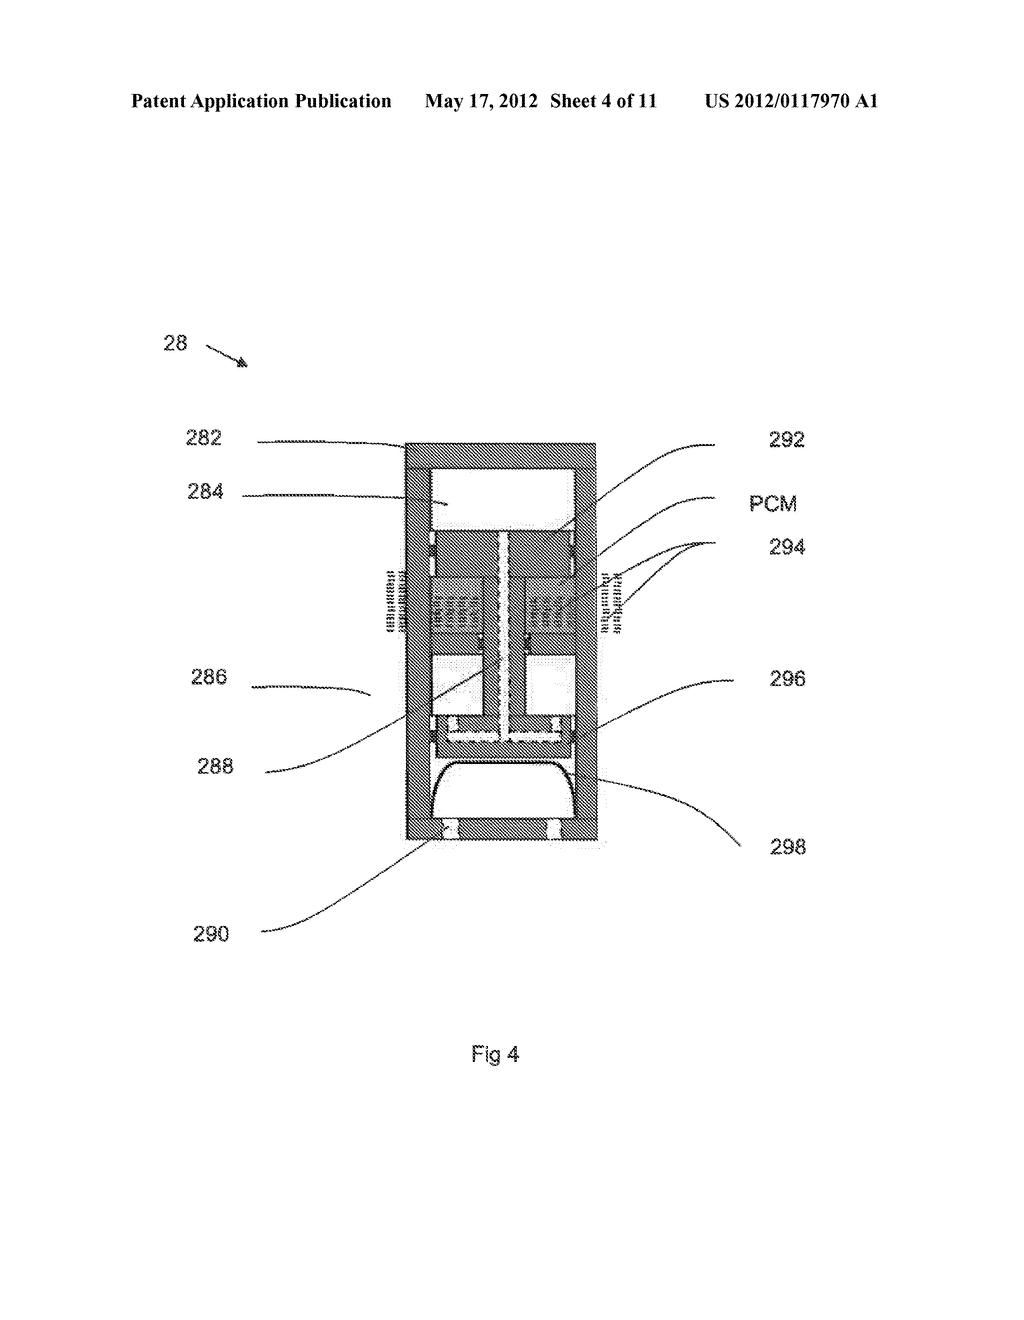 hydraulic pressure transducer and hydraulic system diagram rh patentsencyclopedia com